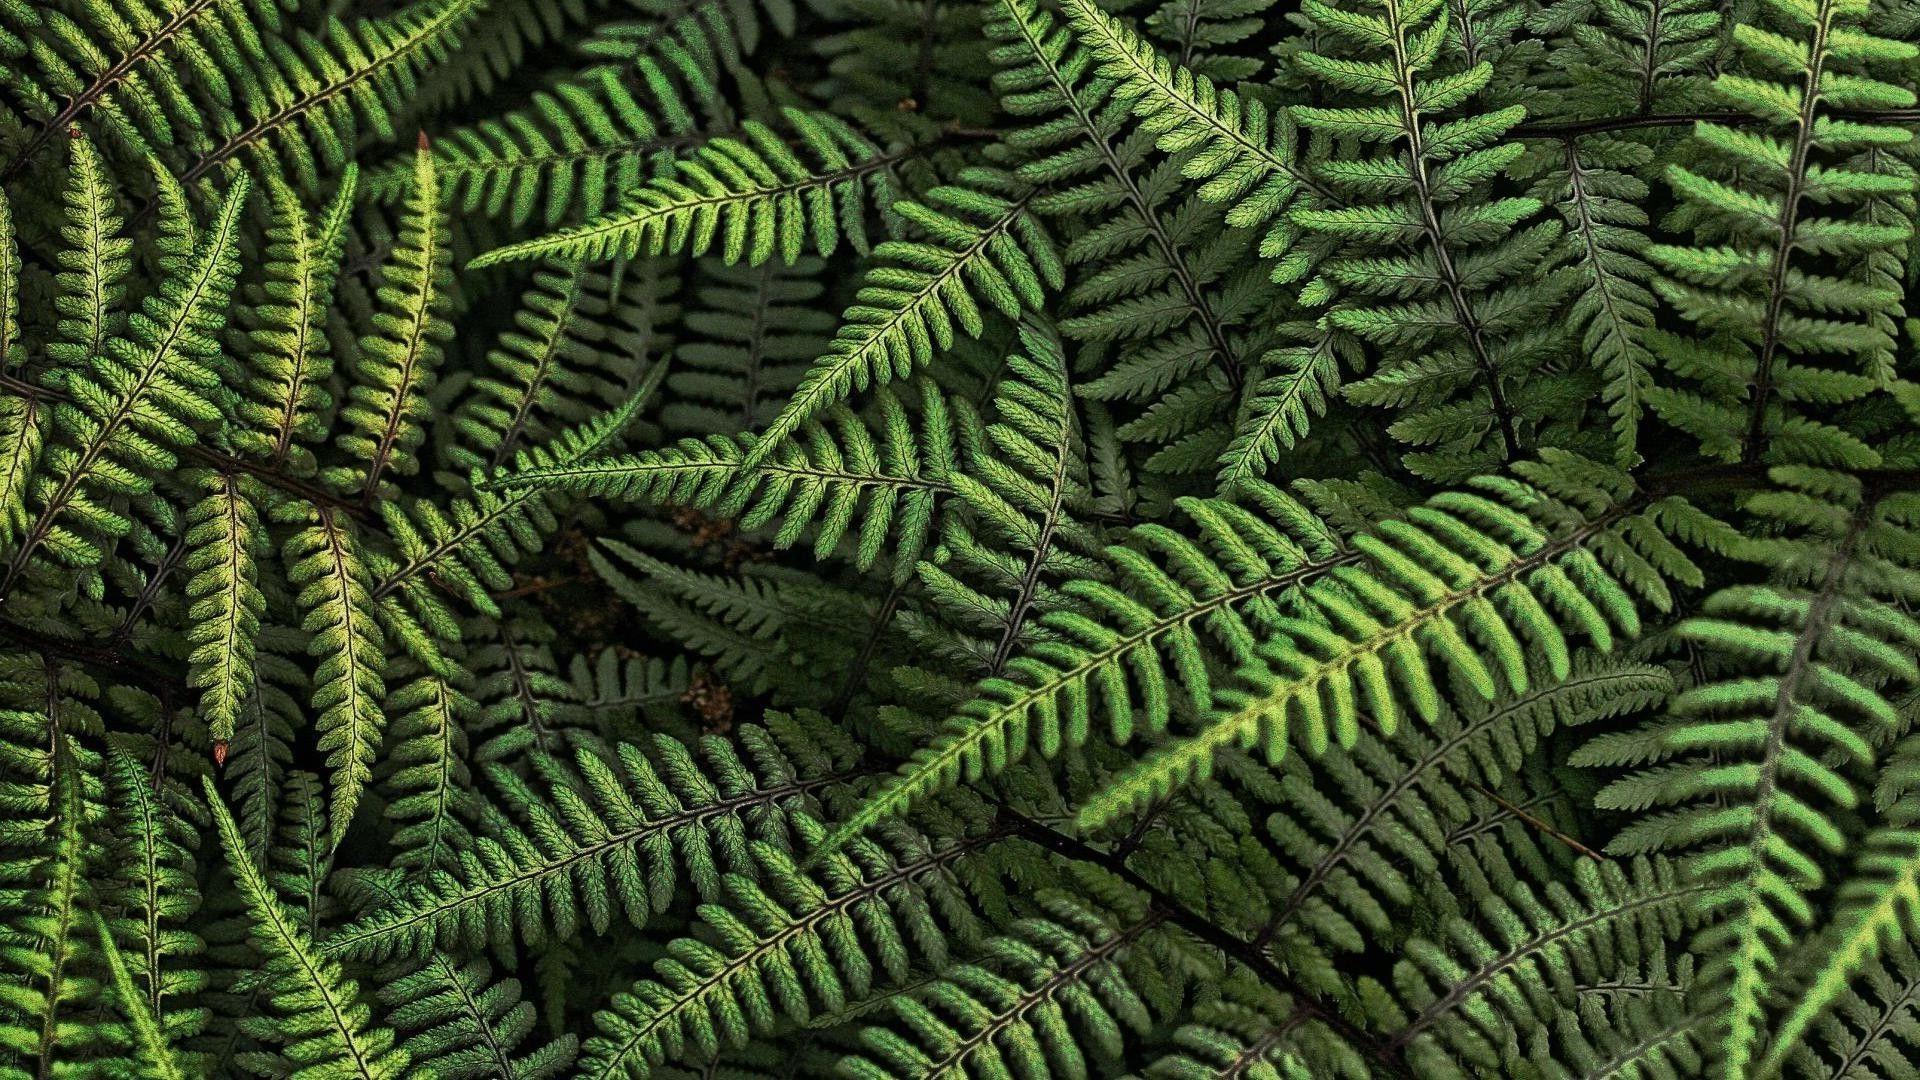 Leaf Pattern wallpaper photo full hd